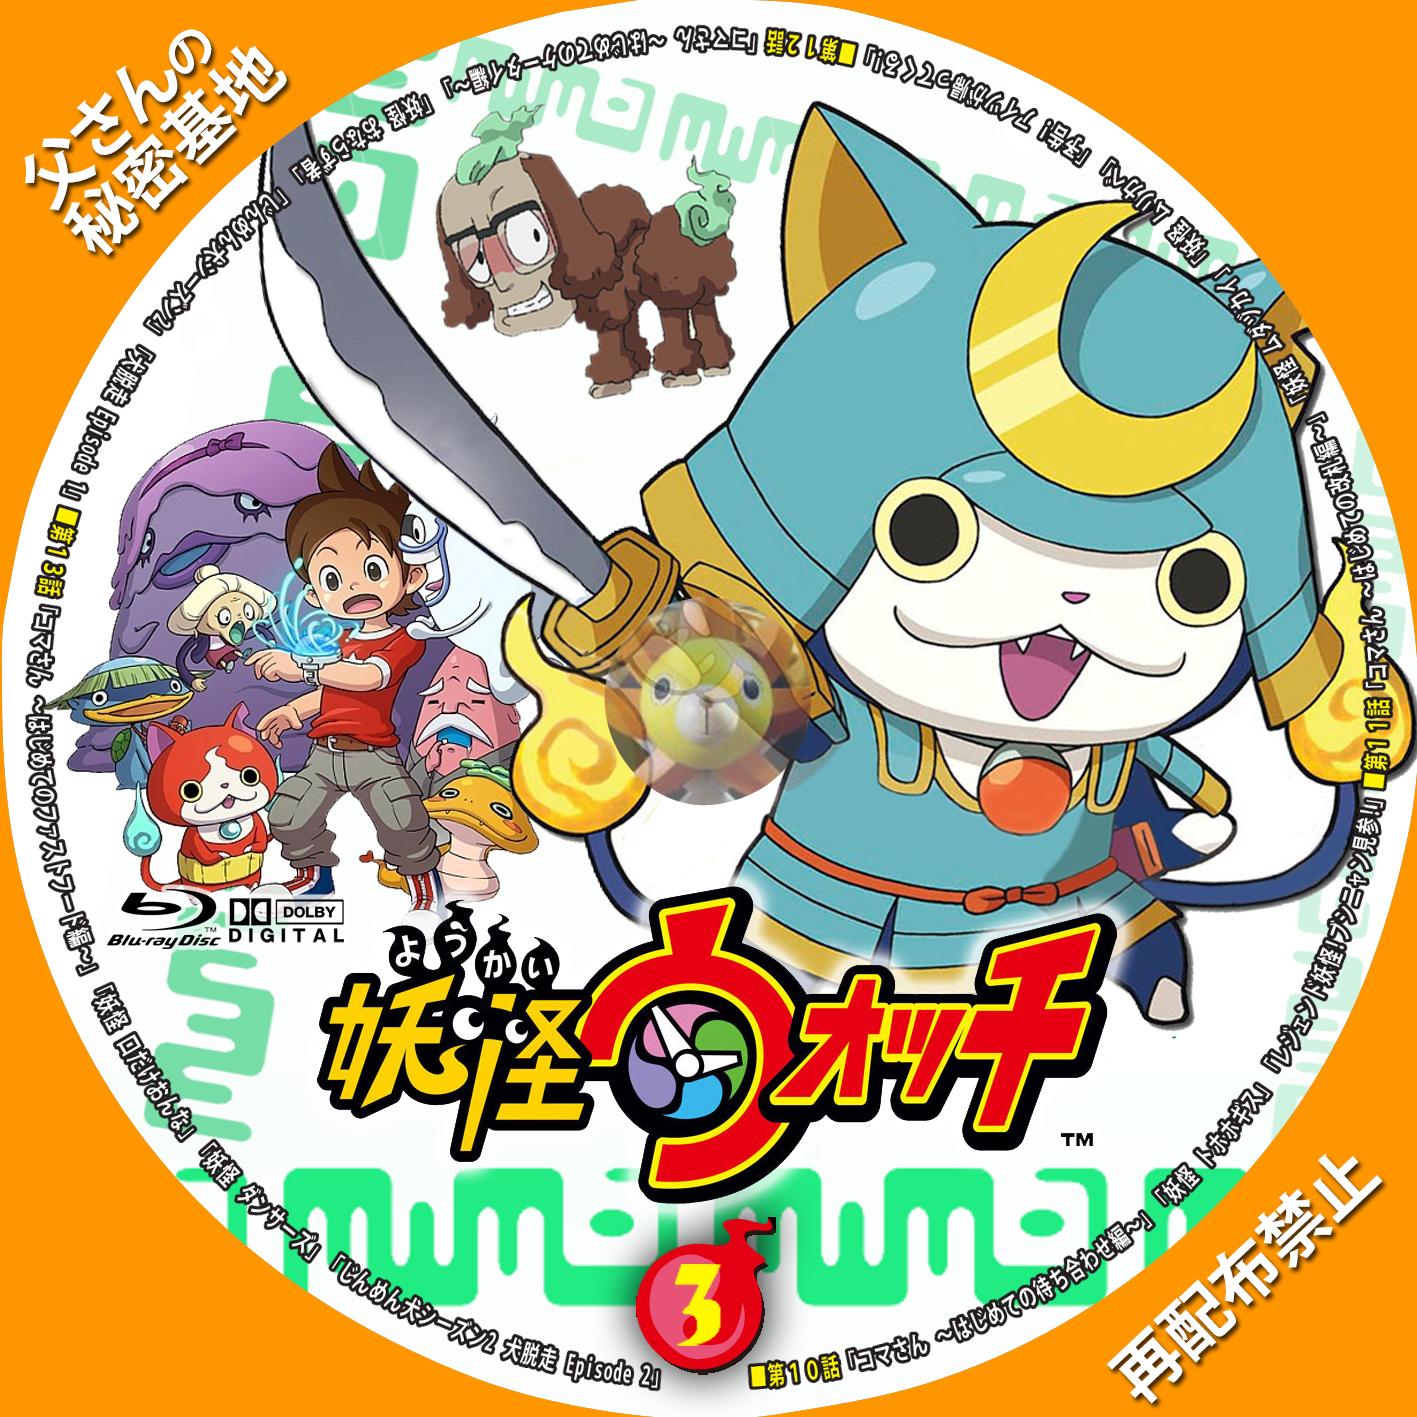 youkai-watchBD_03b.jpg